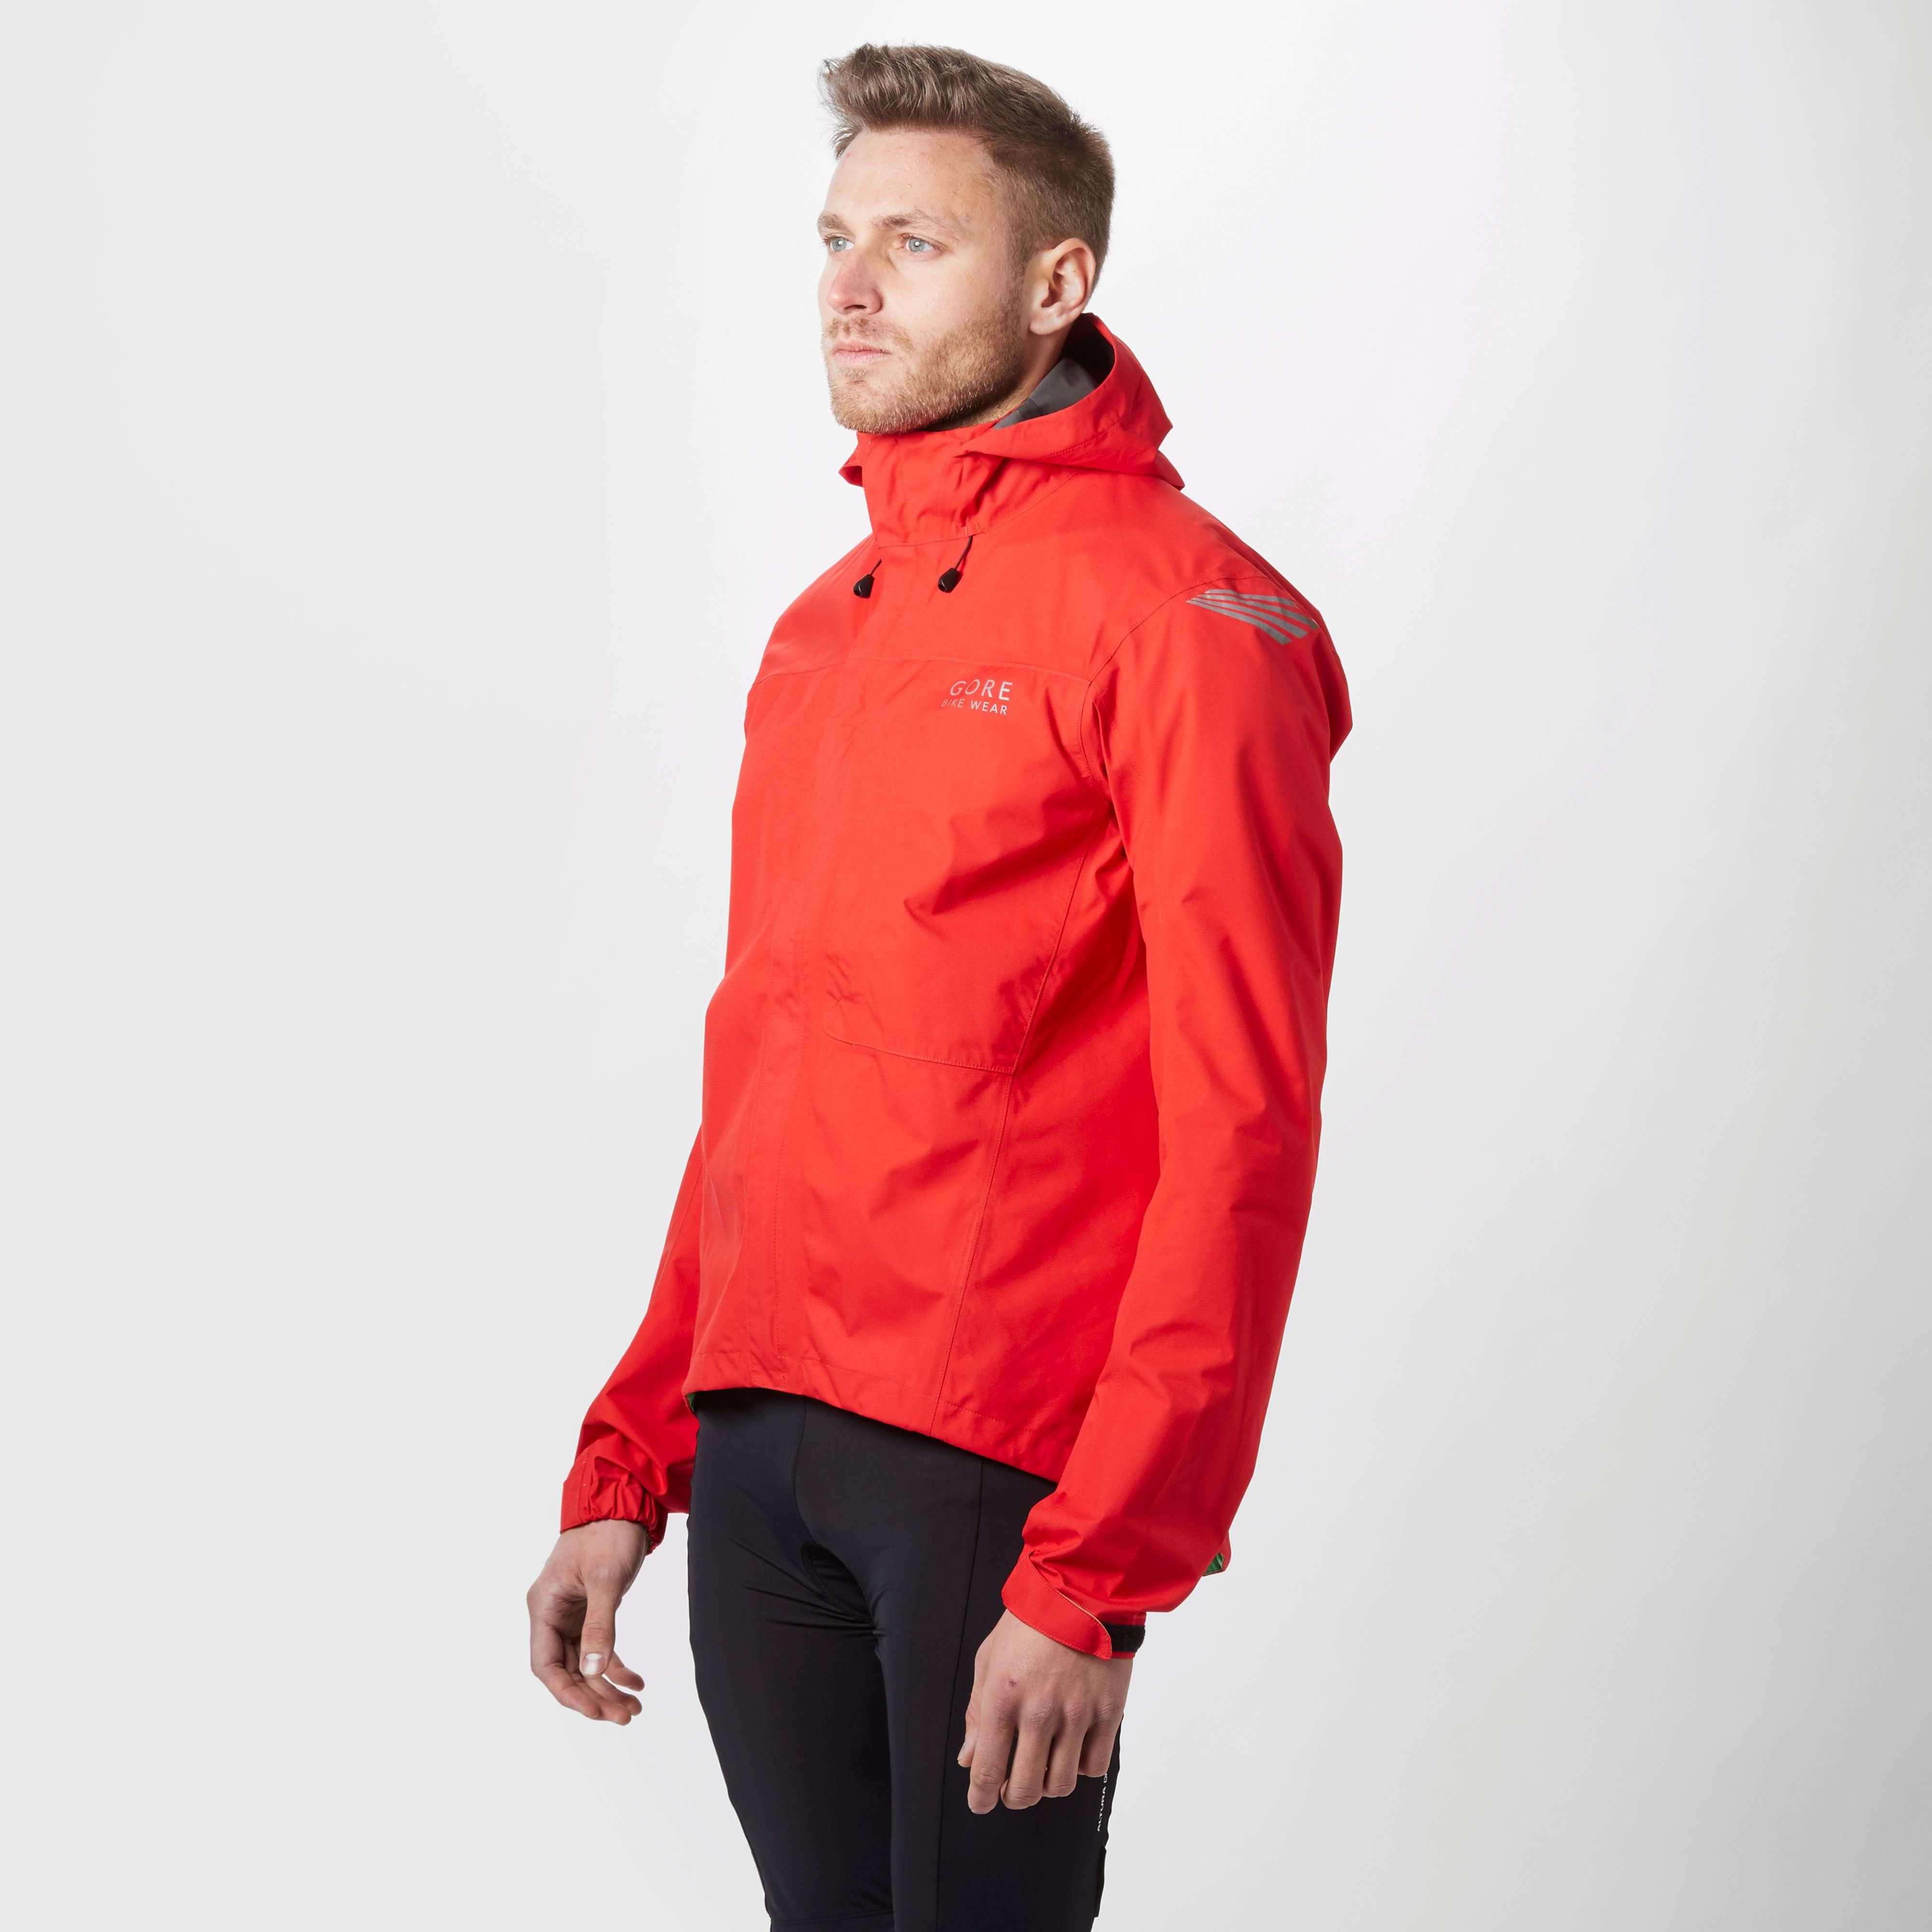 GORE Men's GORE-TEX® PackLite Jacket